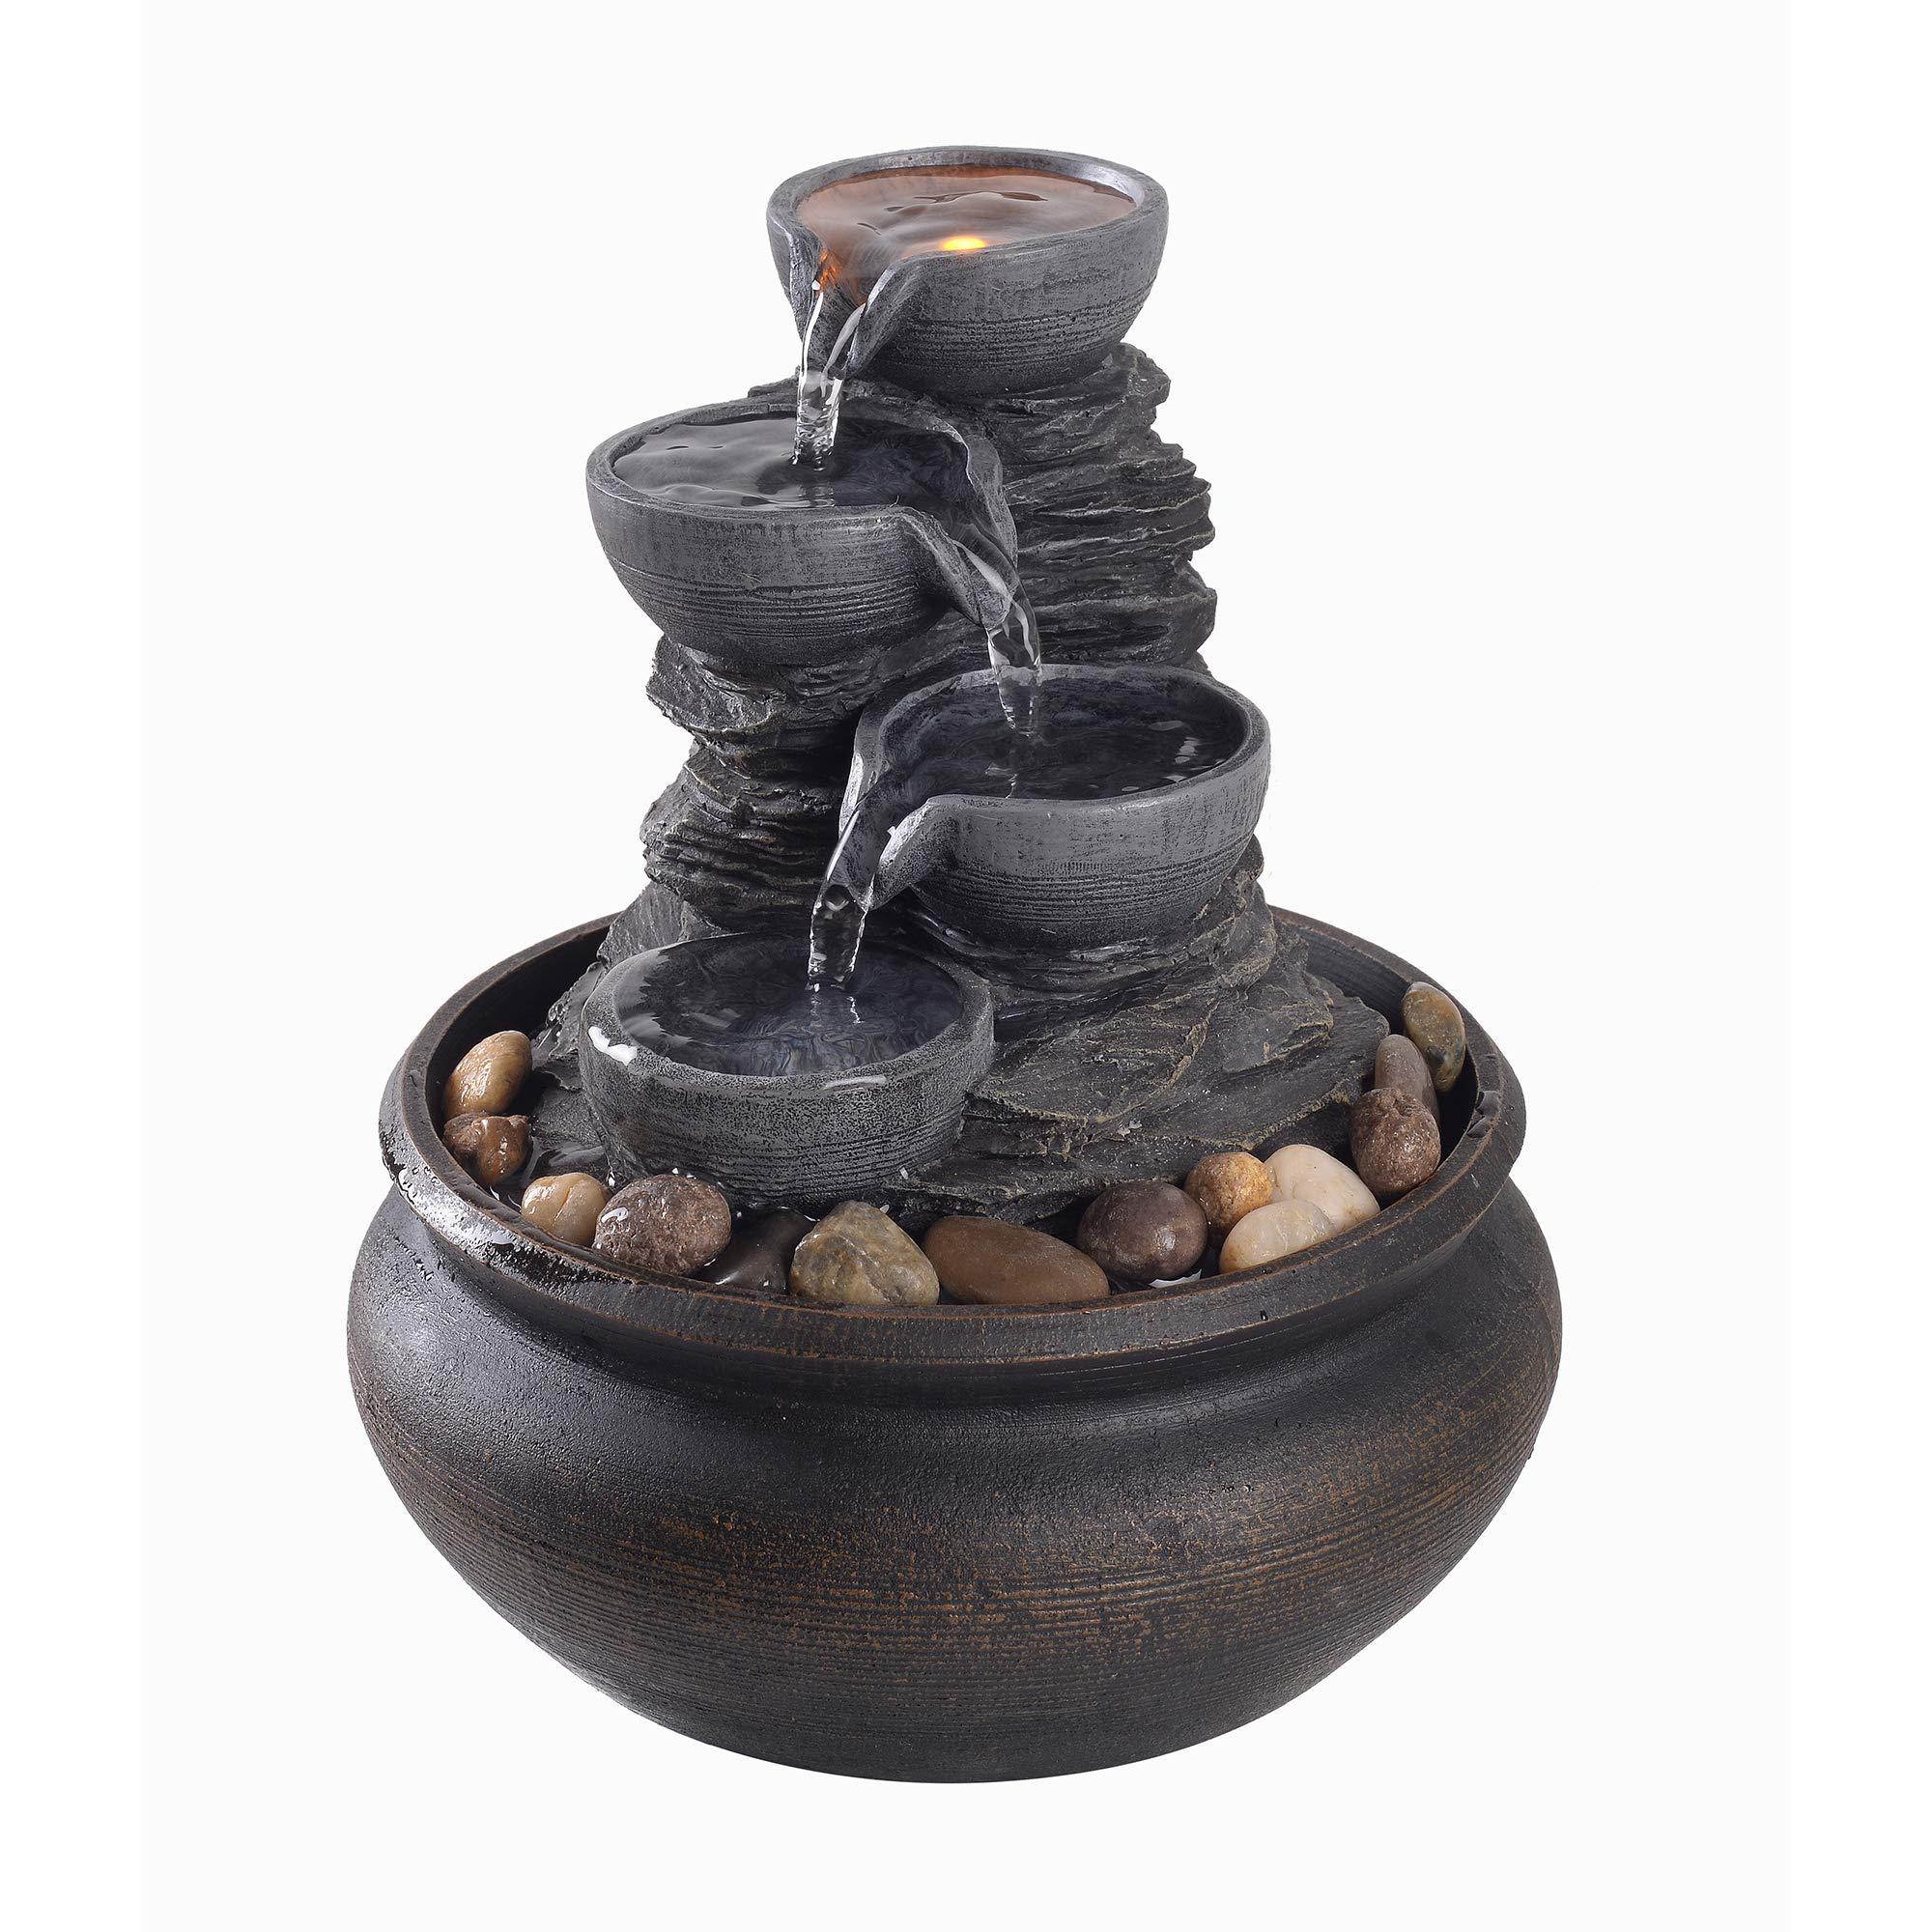 Peaktop Tabletop Water Garden Zen Fountain with LED Light, 5.9'' Height, Stone Grey